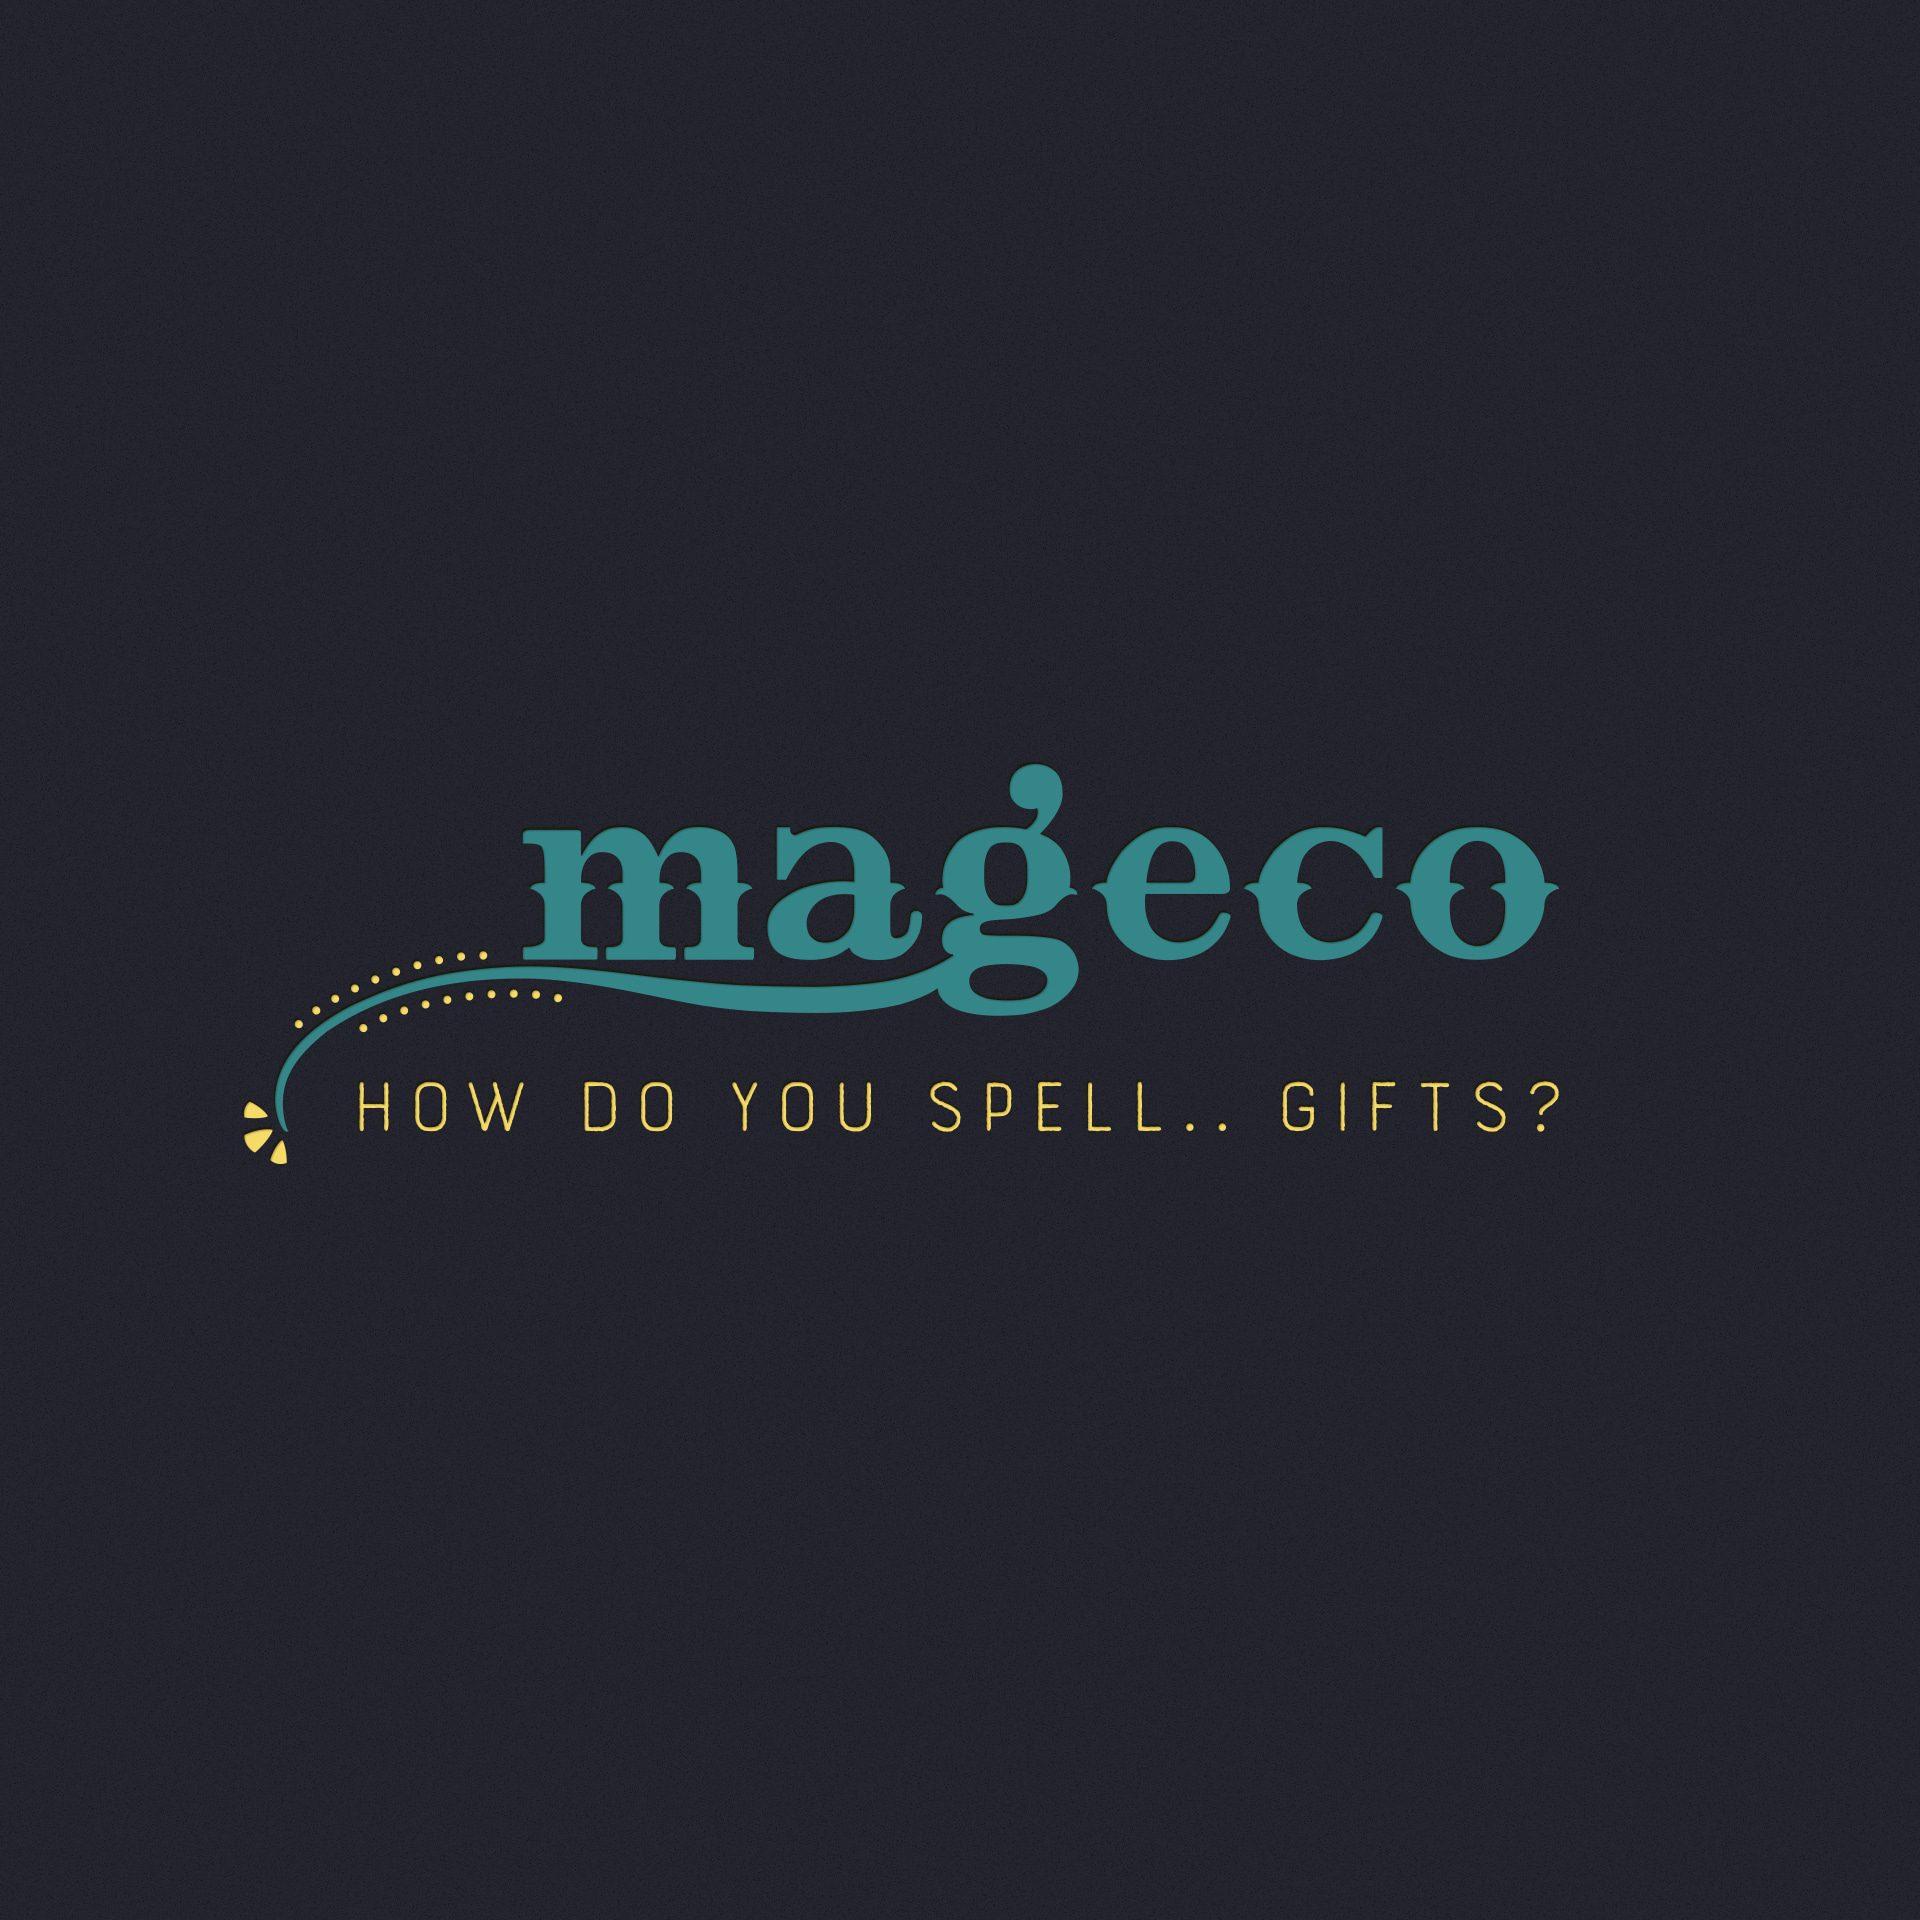 Eshop Mageco: Μία ακόμη επιχείρηση που ξεκίνησε μαζί μας και πέτυχε! 4